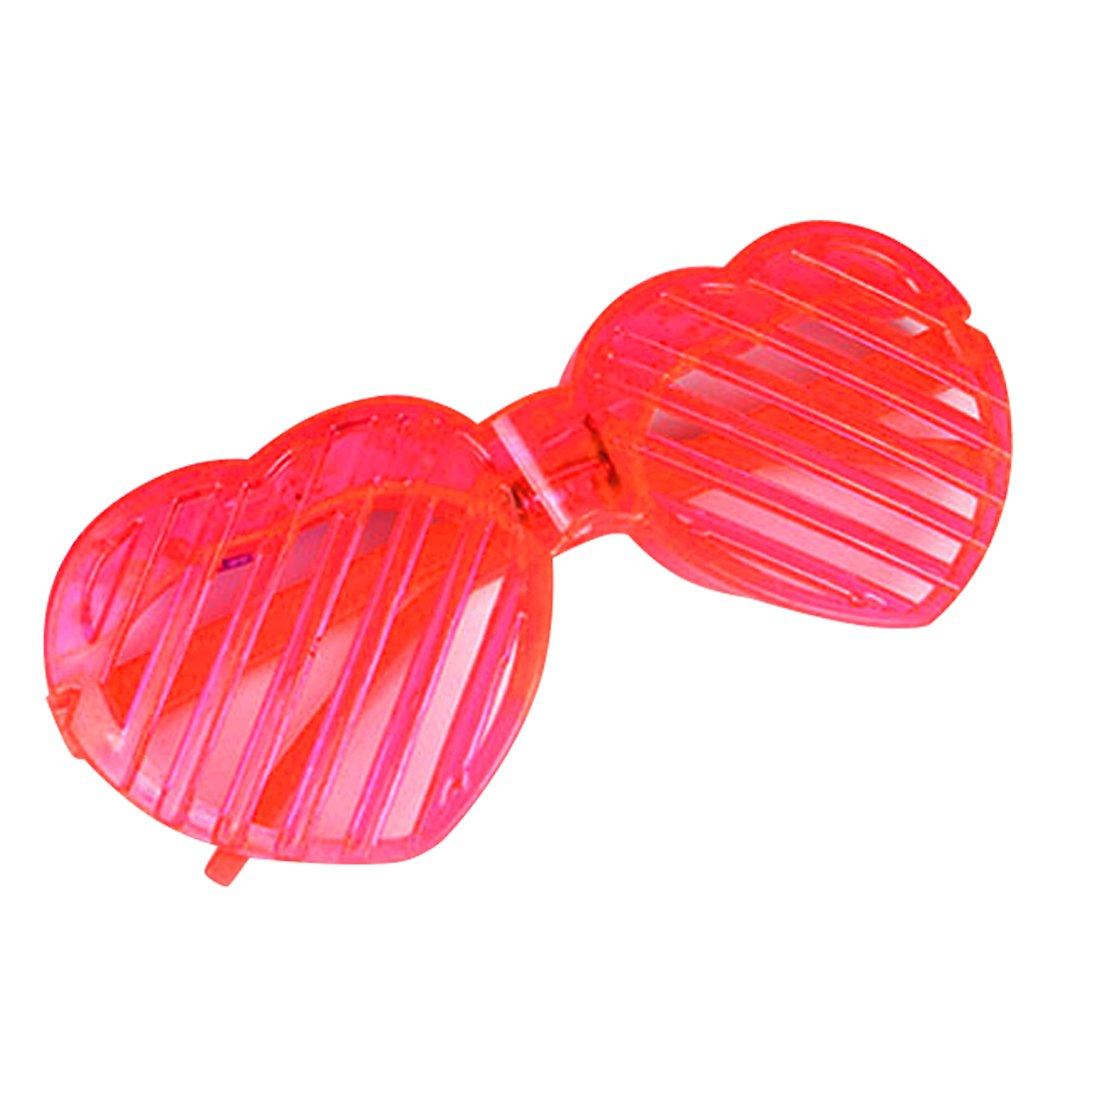 Led Light Glasses for Flash Party Halloween Christmas Luminous Decor Red Heart Luwu-Store